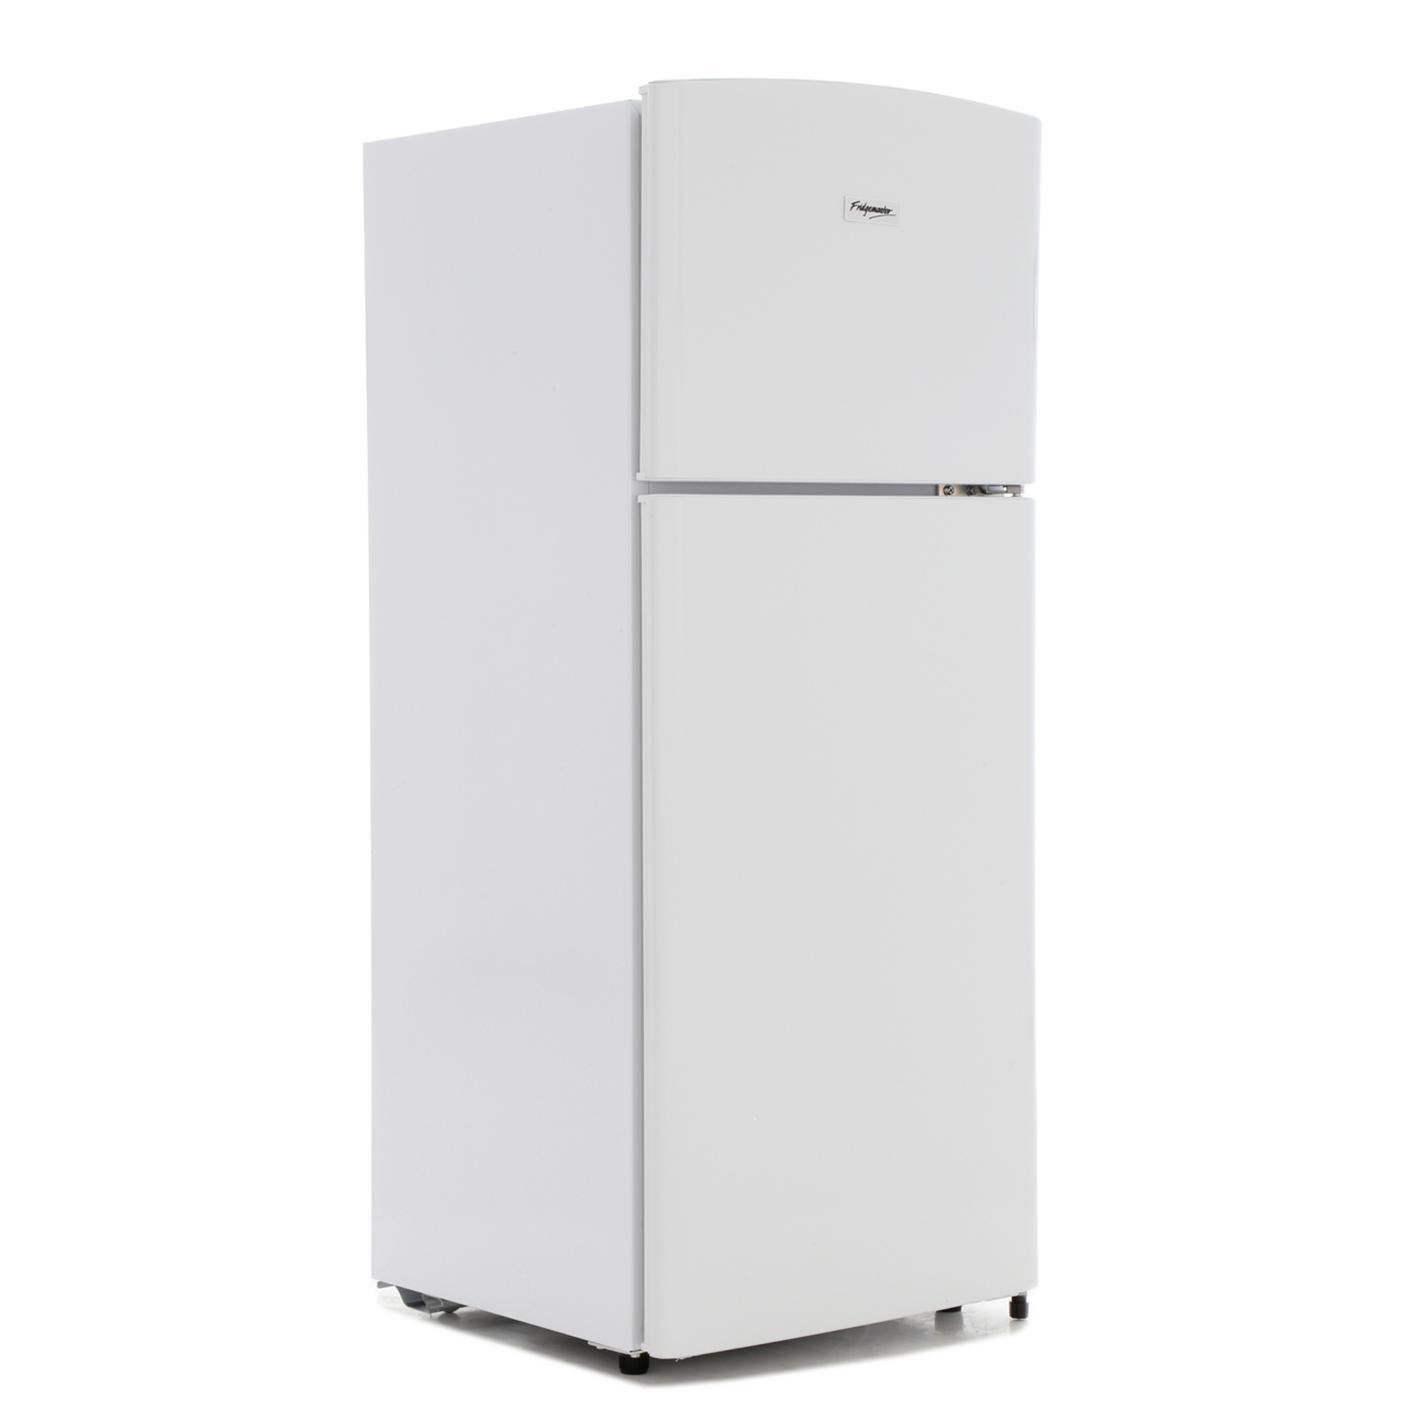 Fridgemaster MTM48120 Fridge Freezer